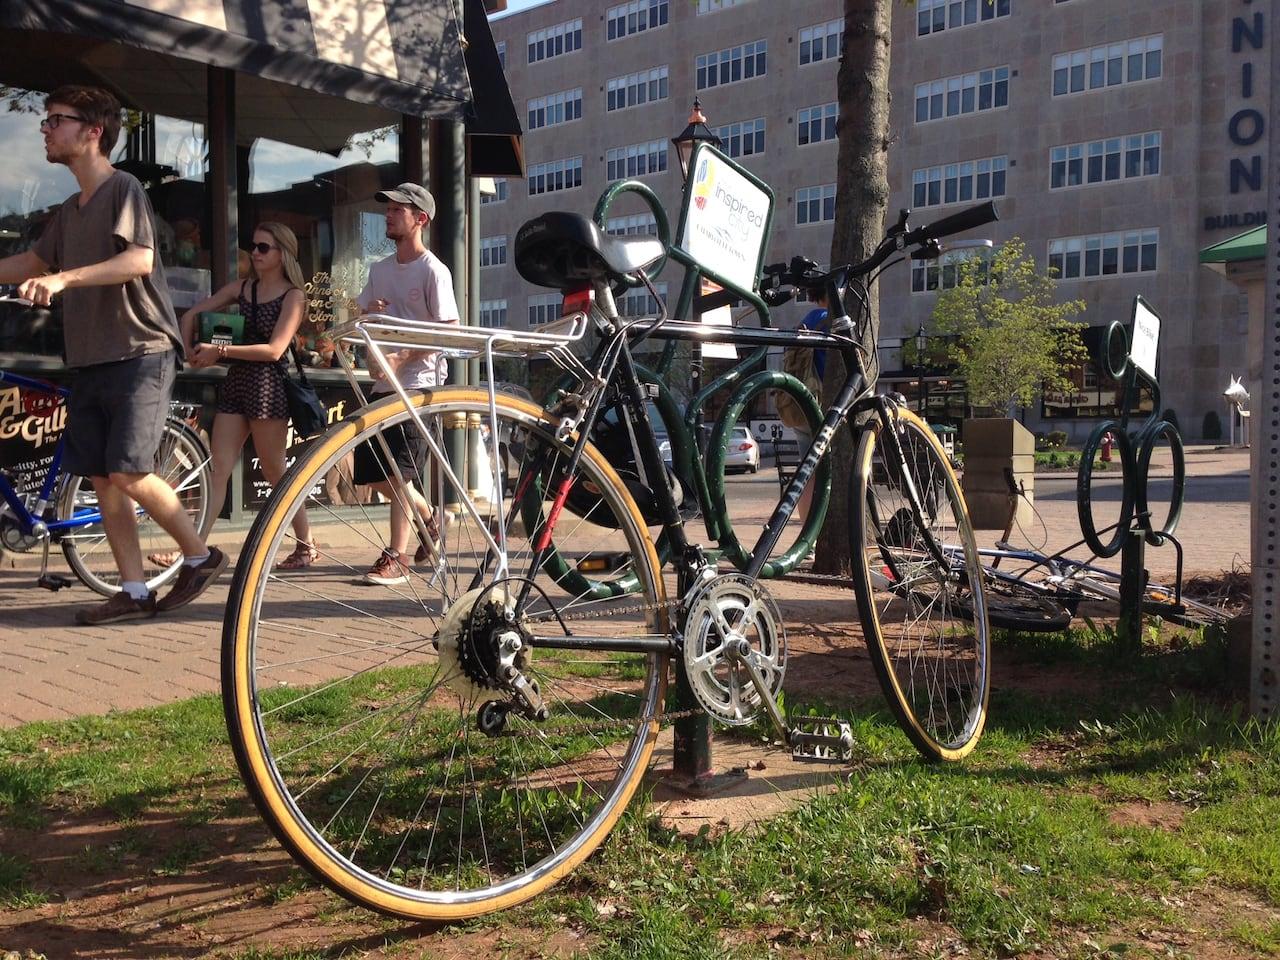 Bike registrations triple in Winnipeg after move to online system